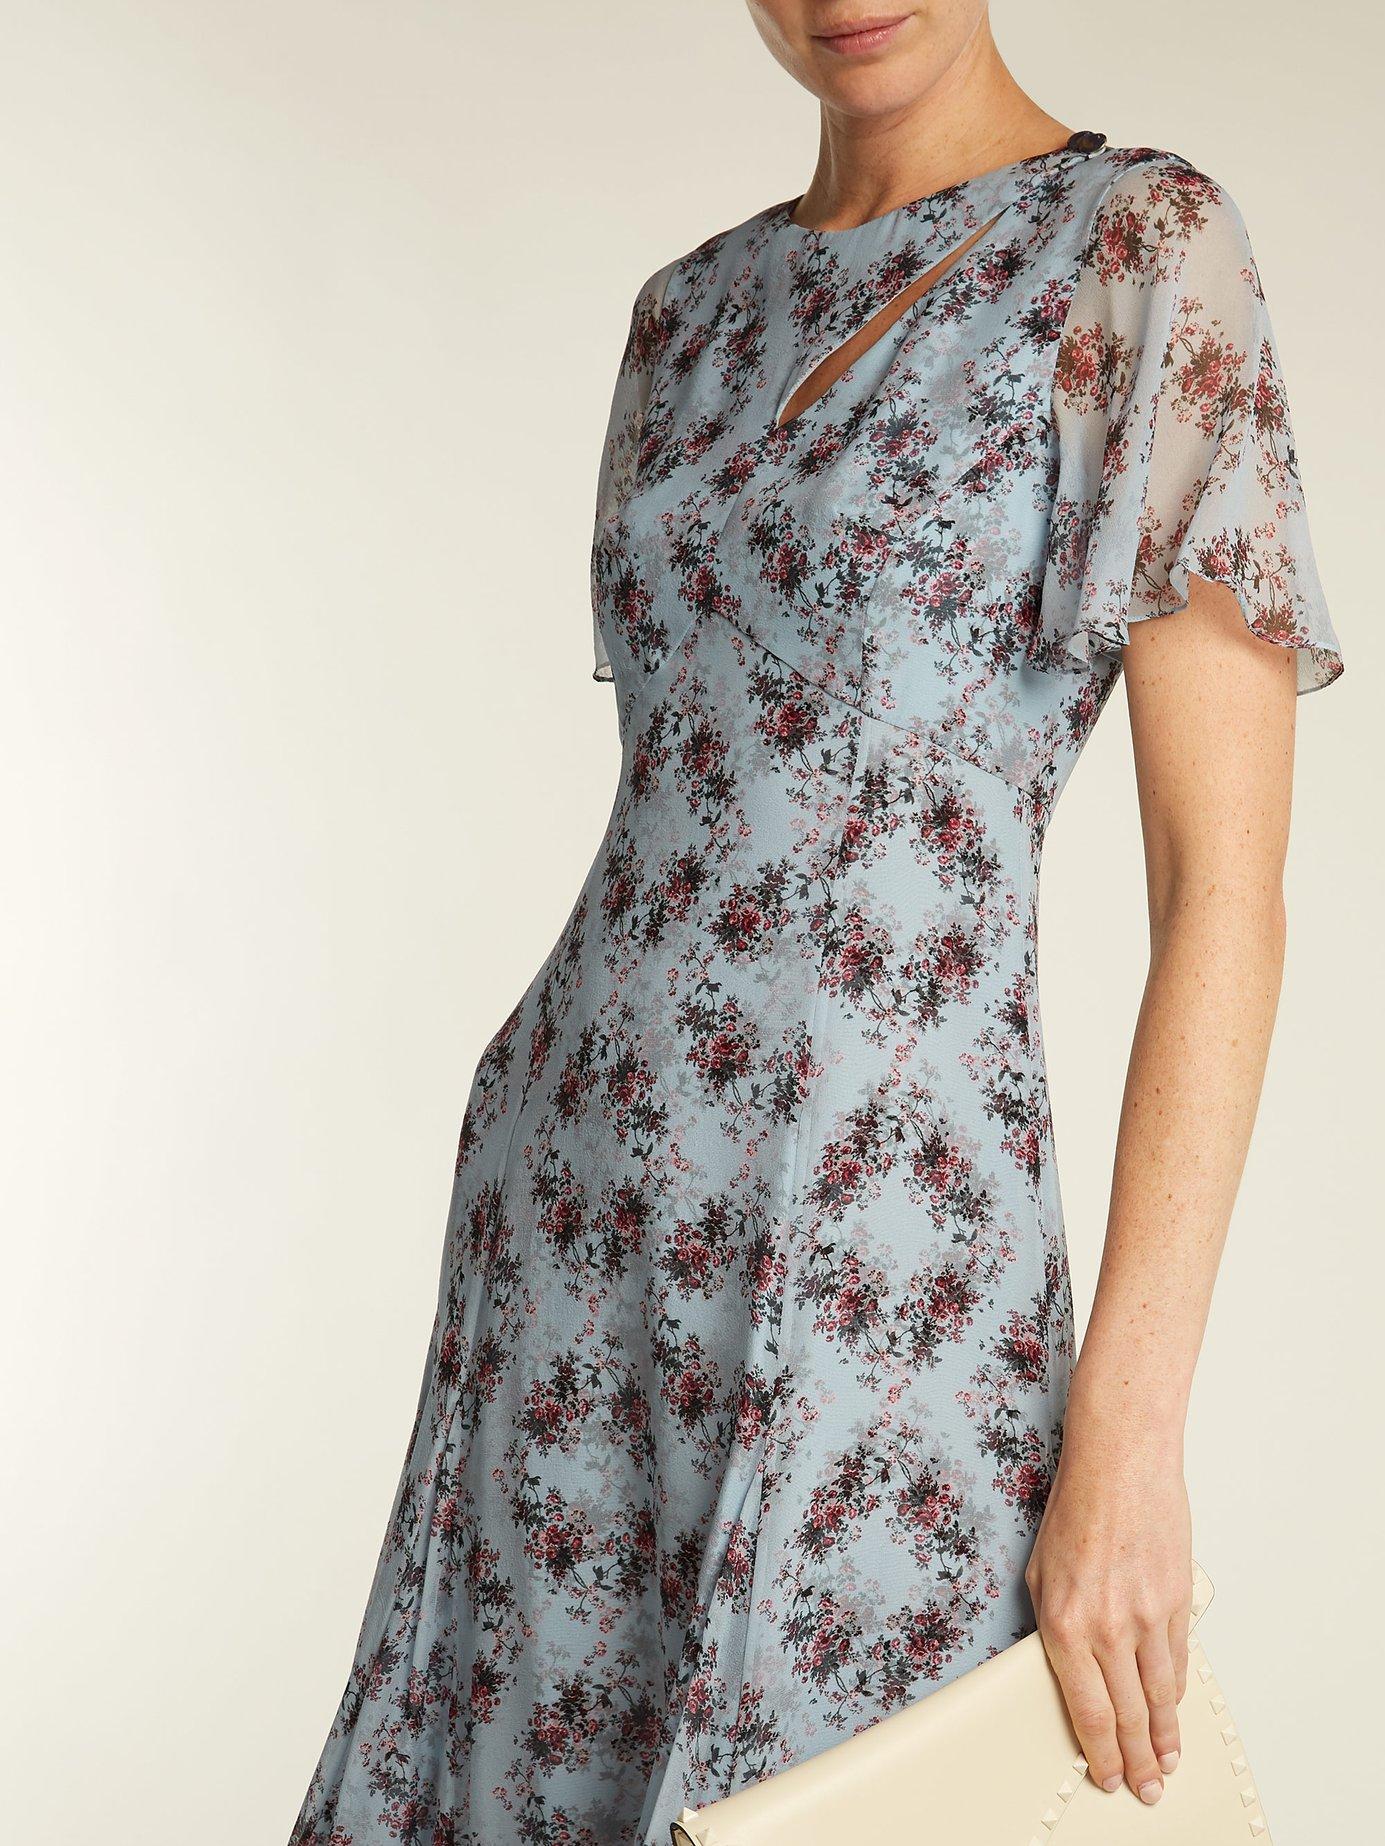 Kathryn Keiko Diamond-print silk dress by Erdem